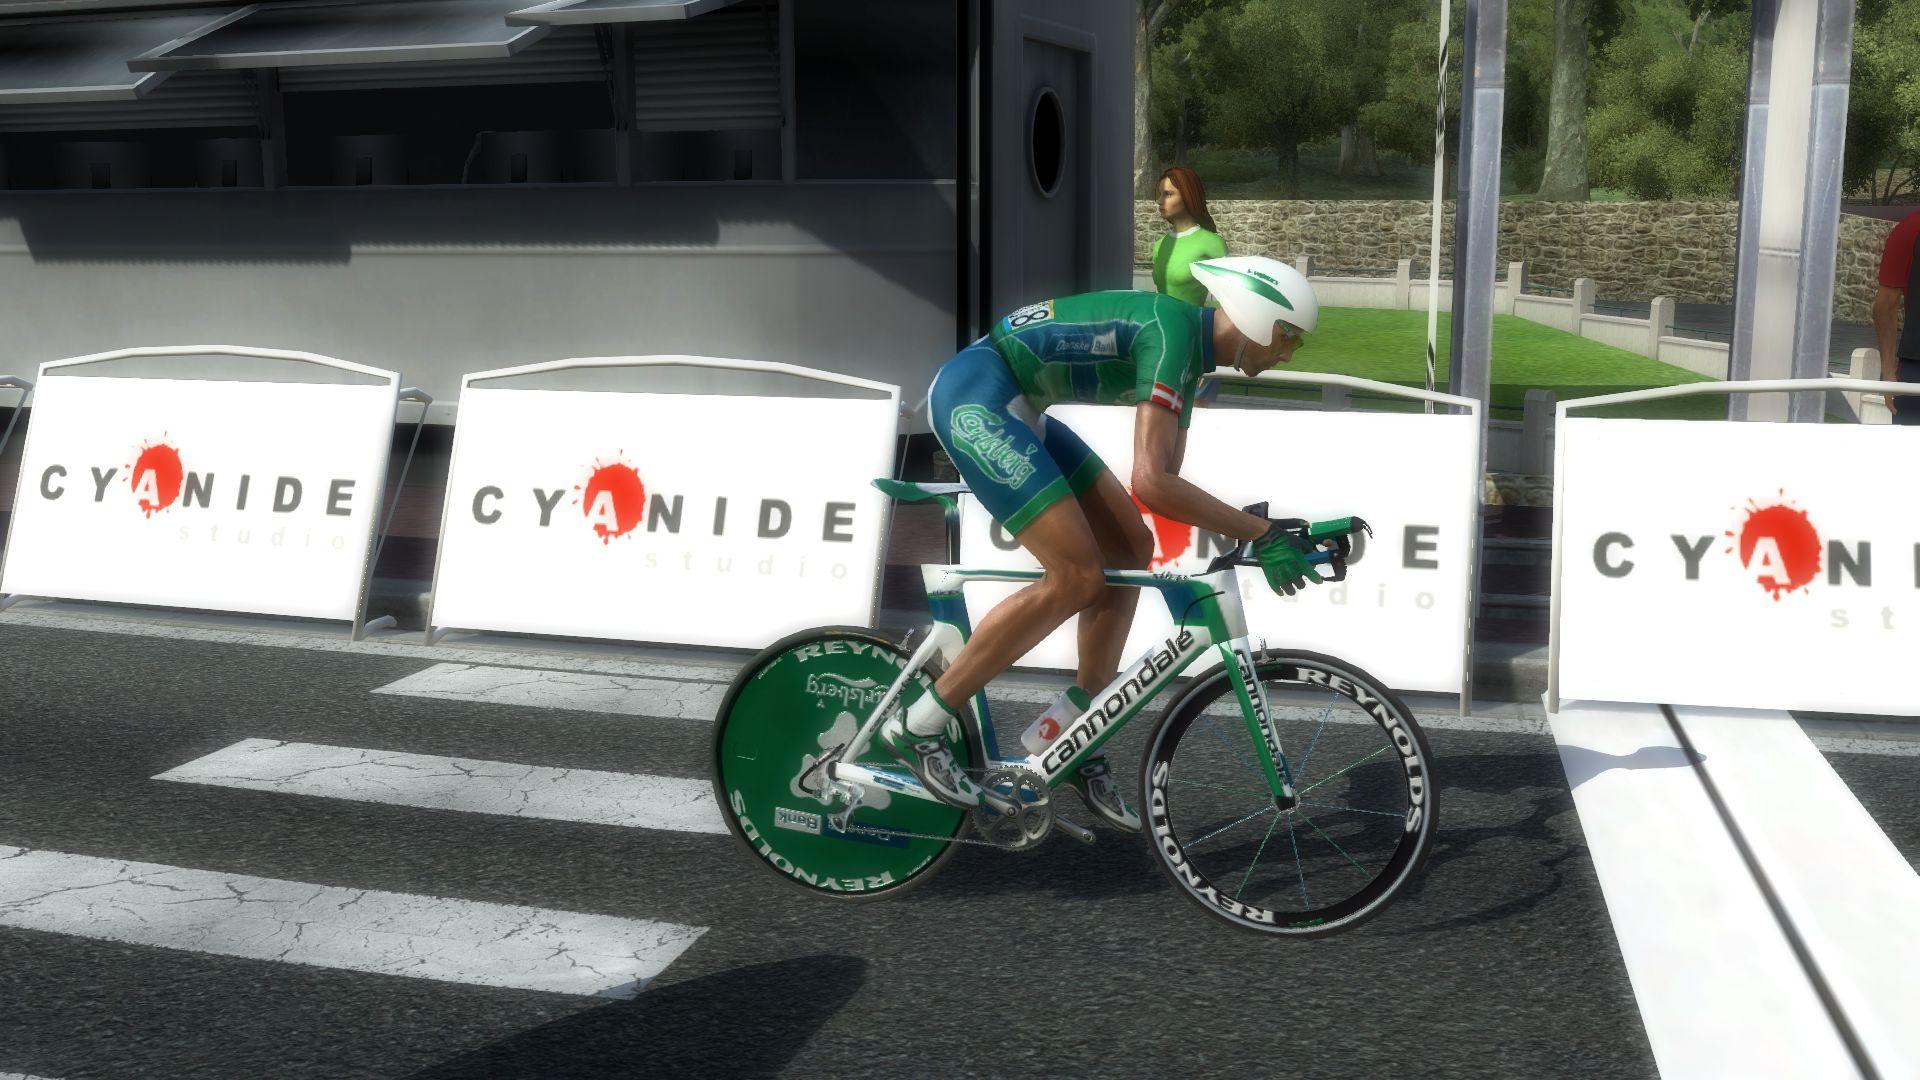 pcmdaily.com/images/mg/2019/Races/C1/Bayern/S4/mg19_bay_s04_35.jpg